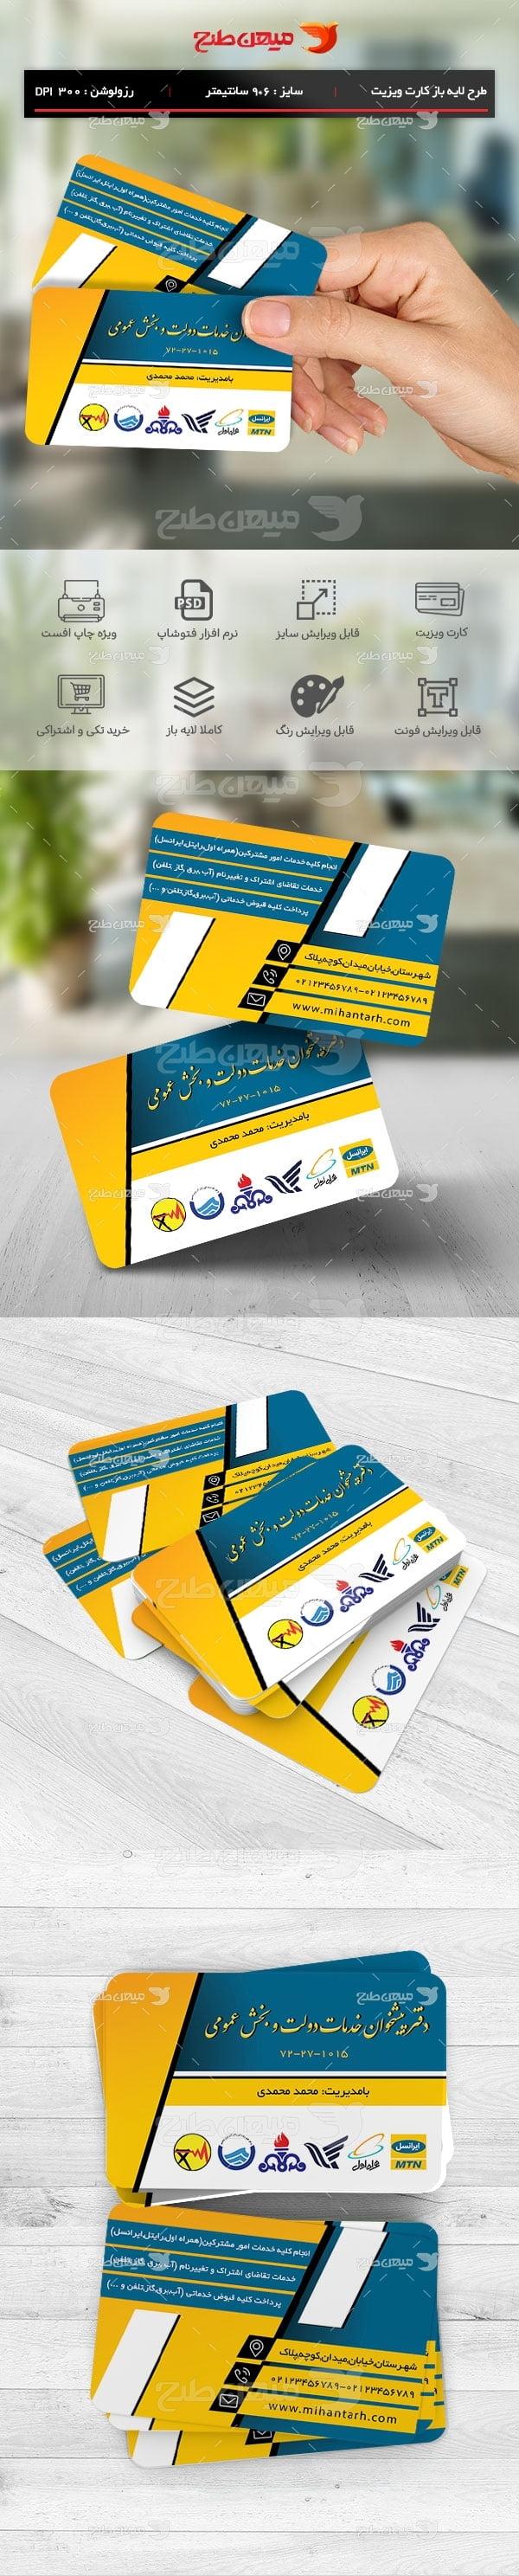 طرح لایه باز کارت ویزیت دفتر پیشخوان دولت